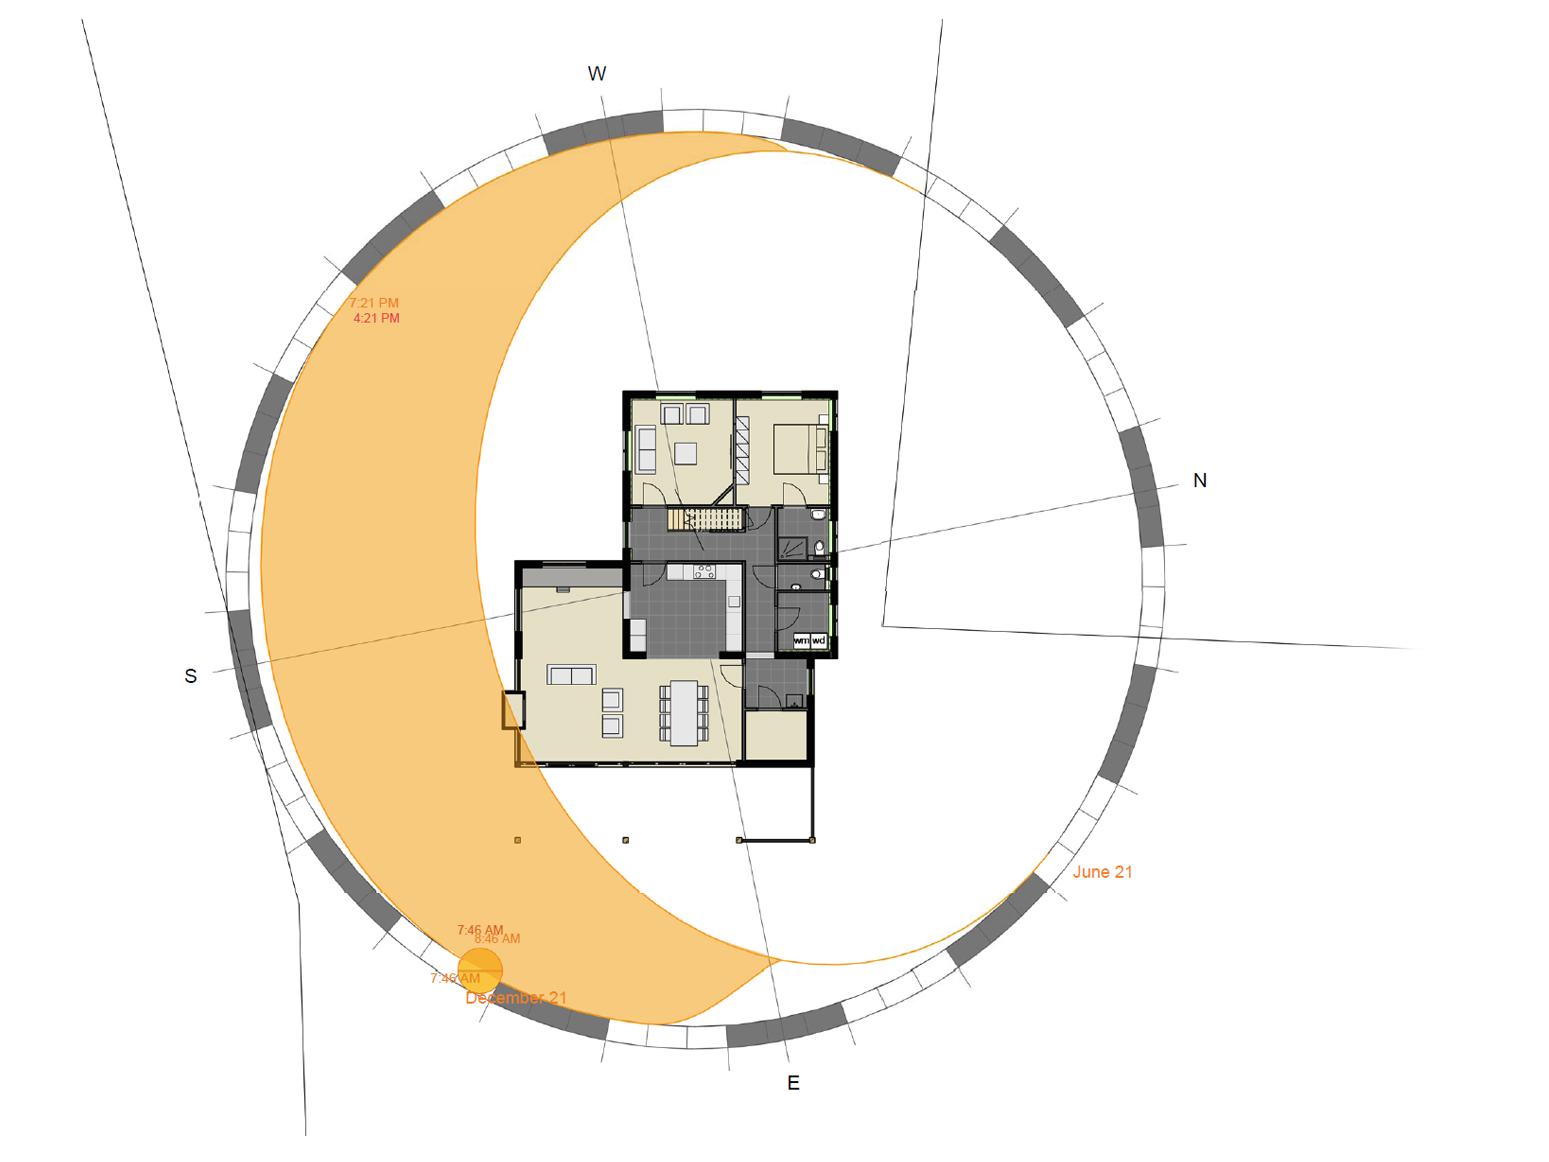 boerderij-verbouwing-uitbouw-beemte-broekland-van-oord-architectuur-en-design-wenum-wiesel-architect-voorst-architect-apeldoorn-4